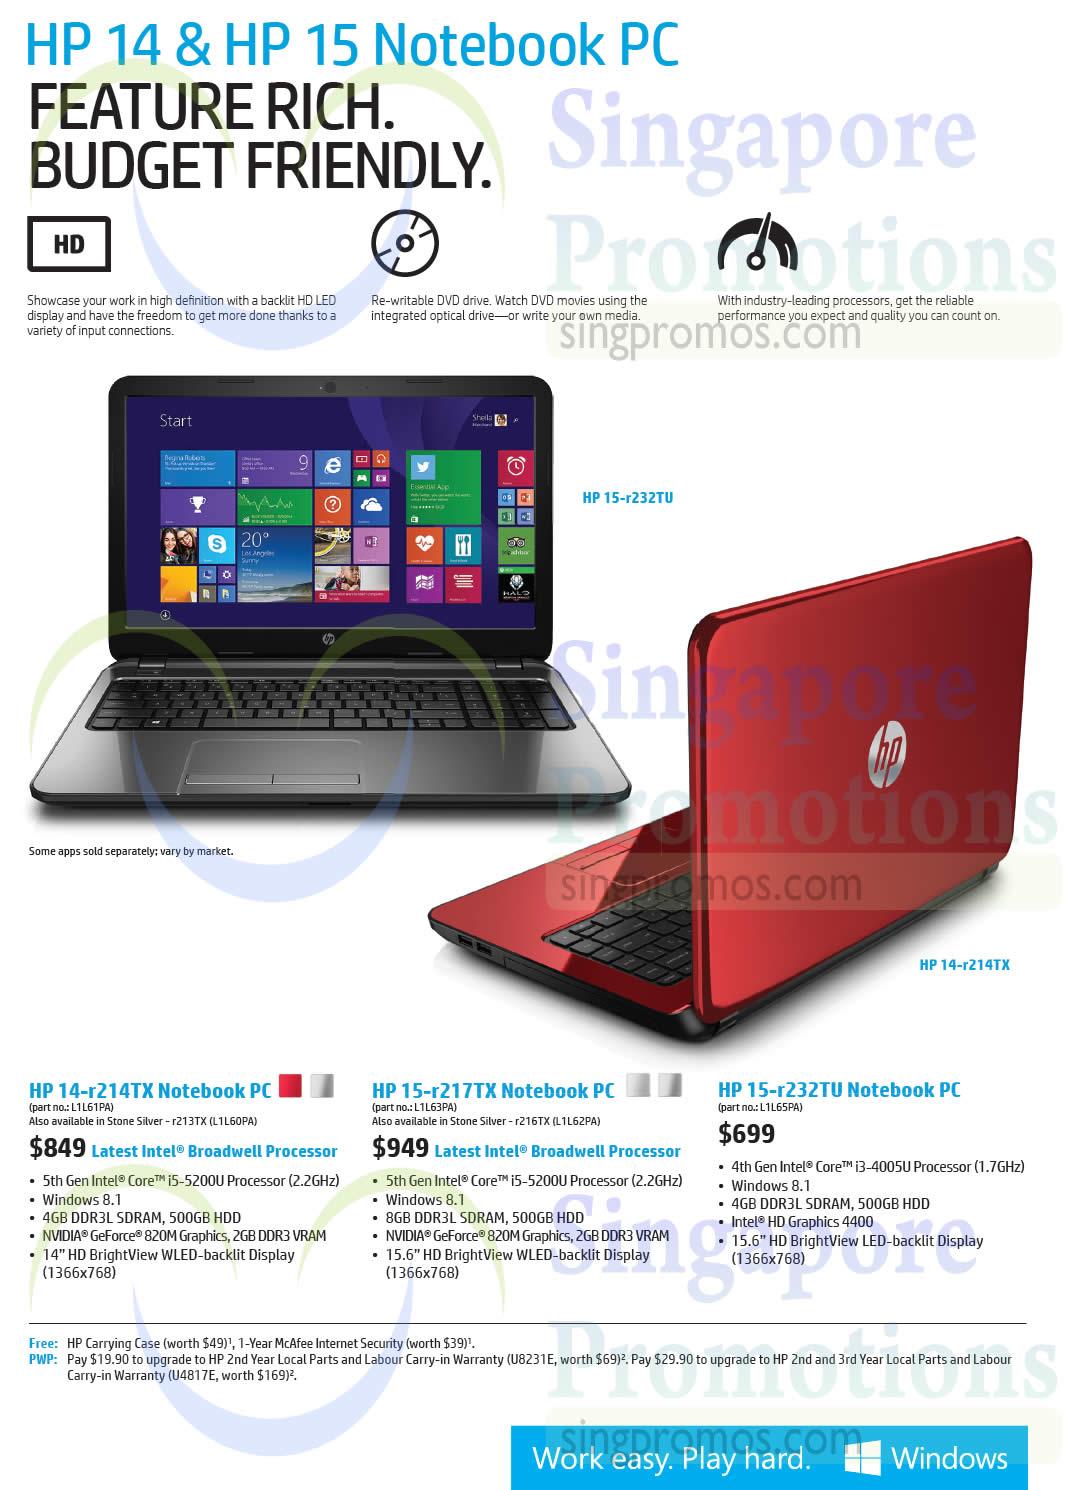 Hp notebook desktop - Notebooks 14 R214tx 15 R217tx 15 R232tu